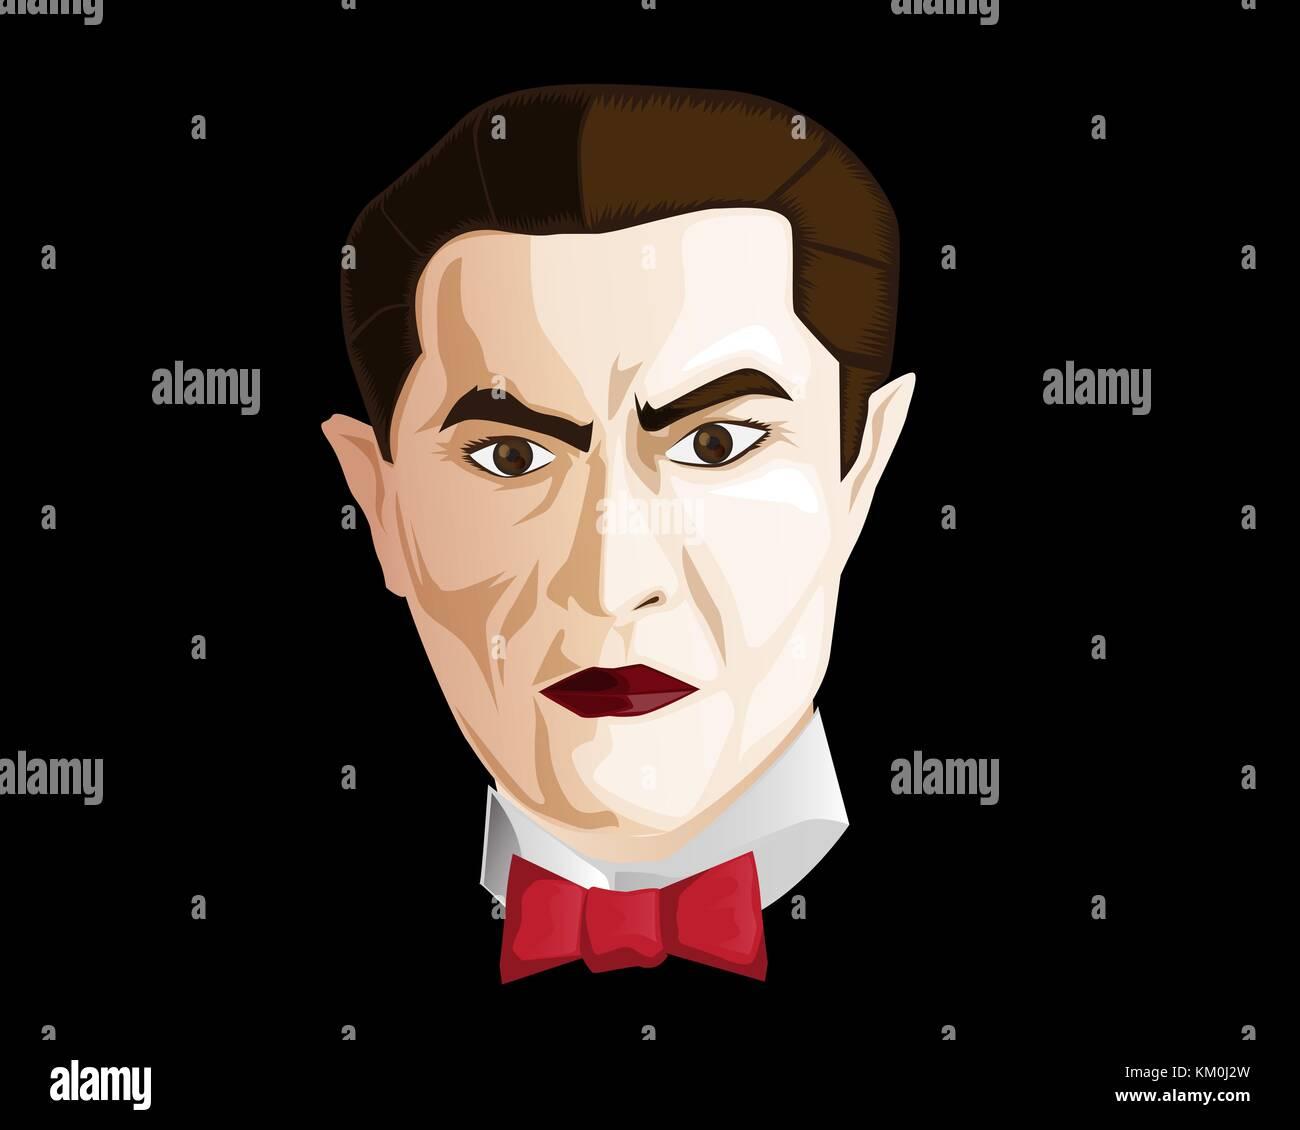 Vampire clip art Photo Stock